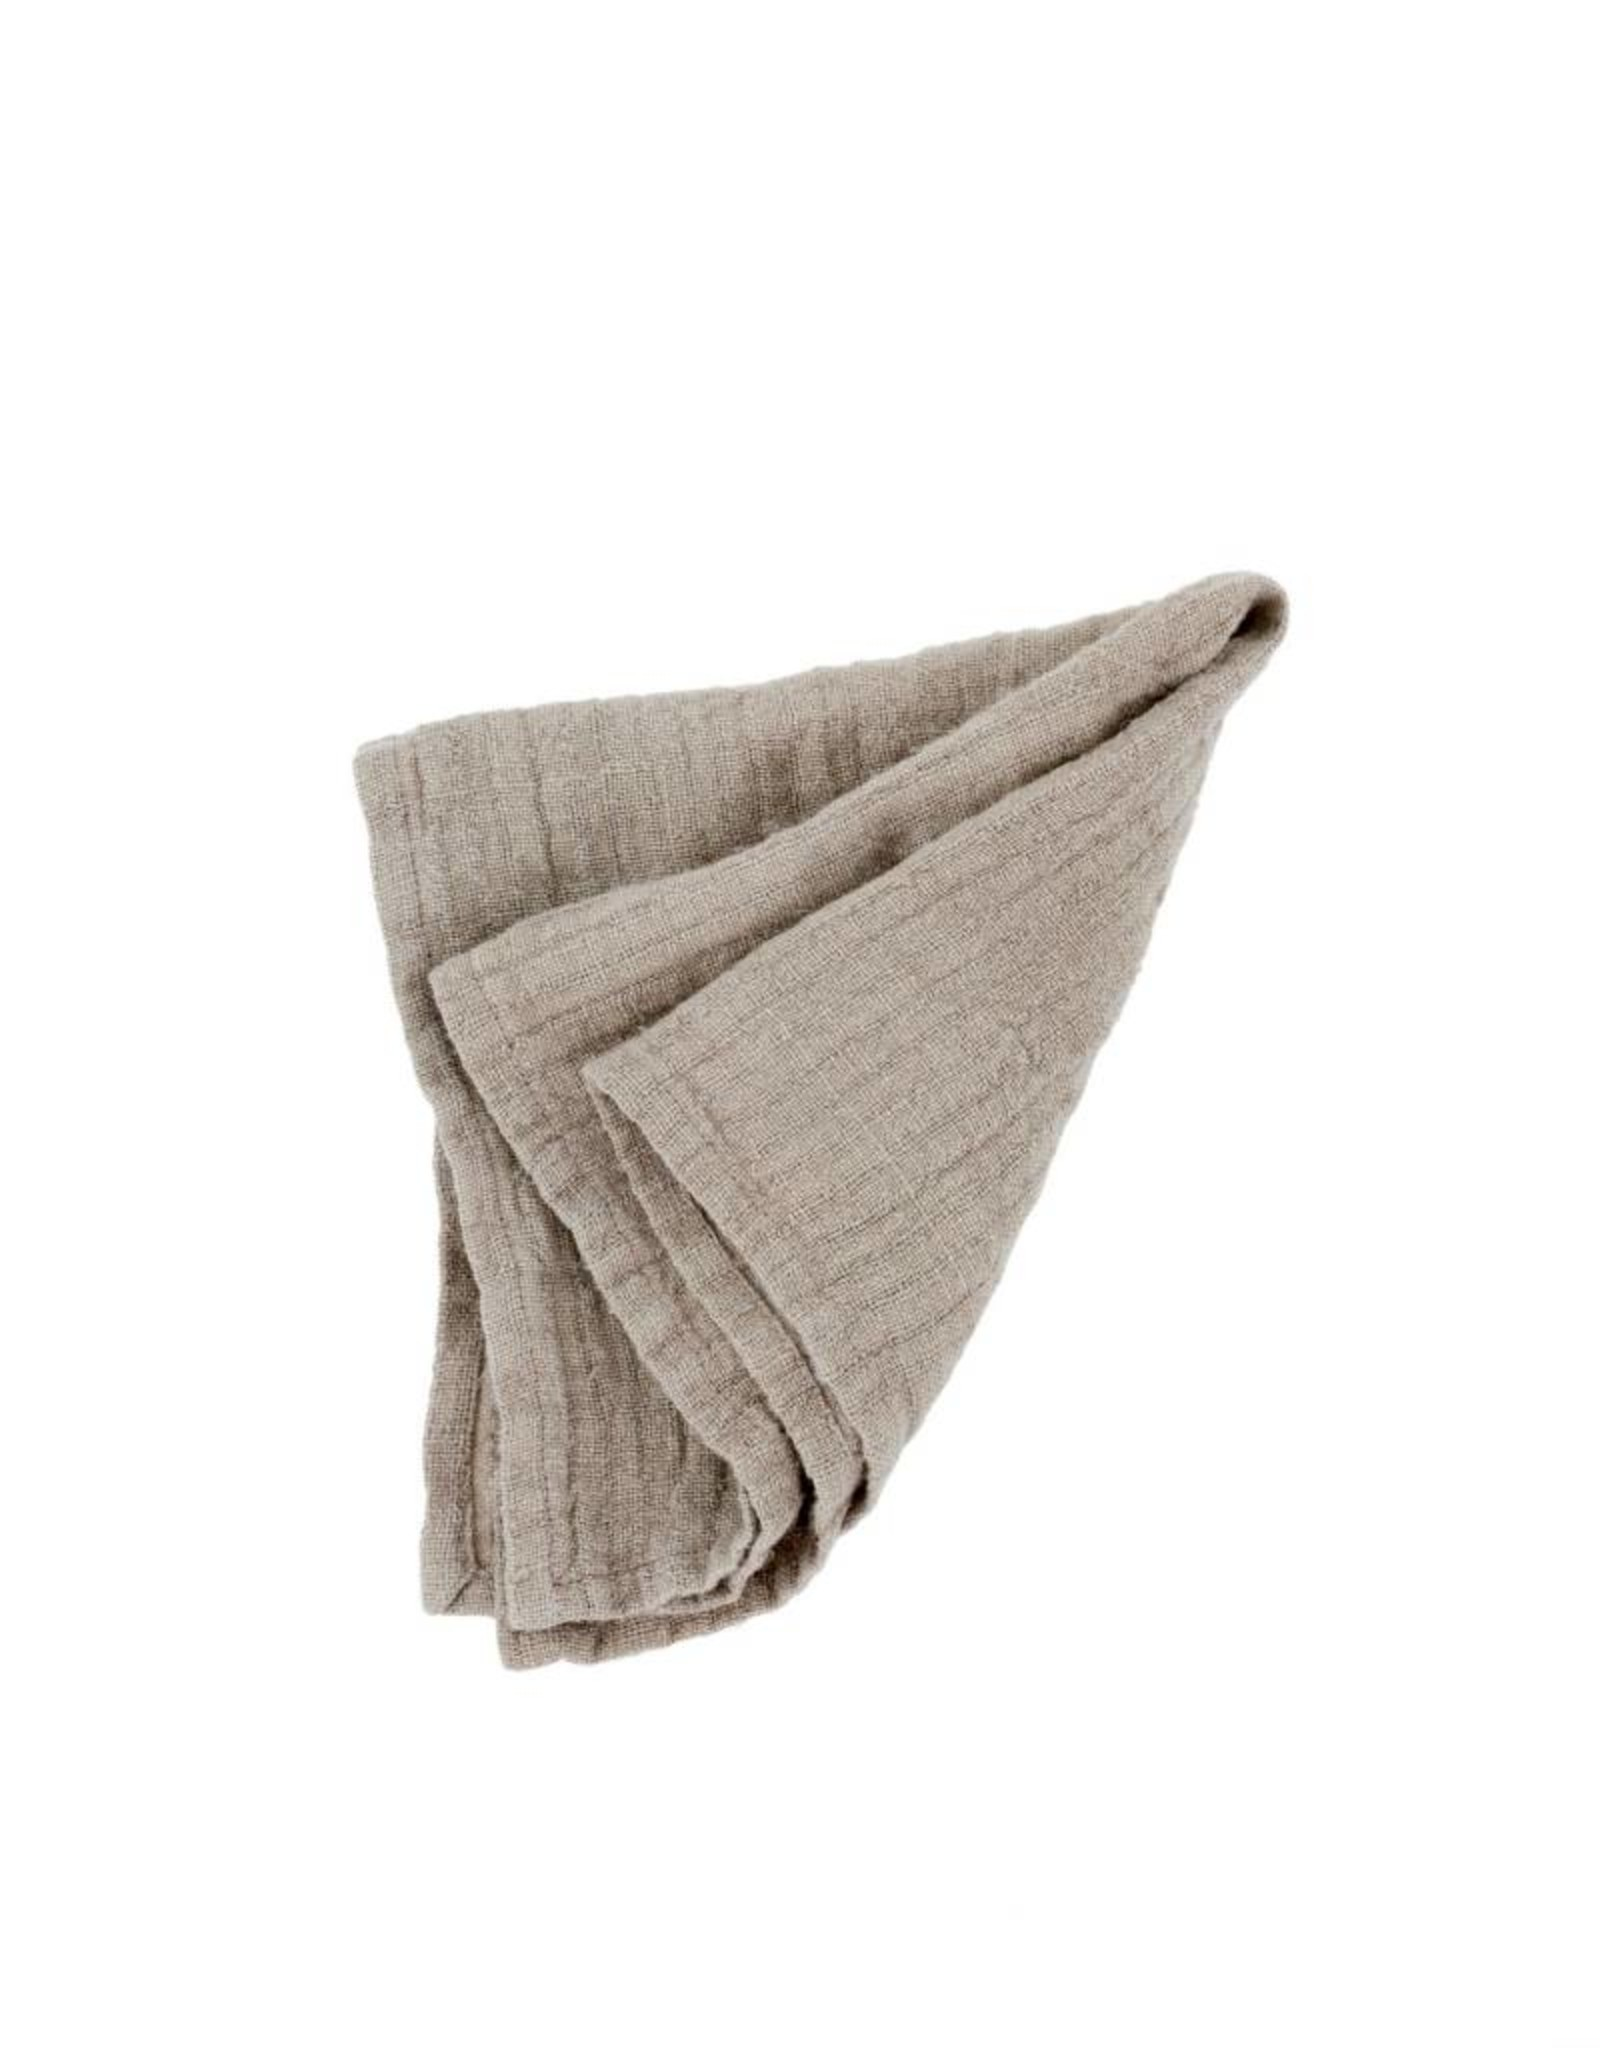 Indaba Rustic Linen Napkin - Stone